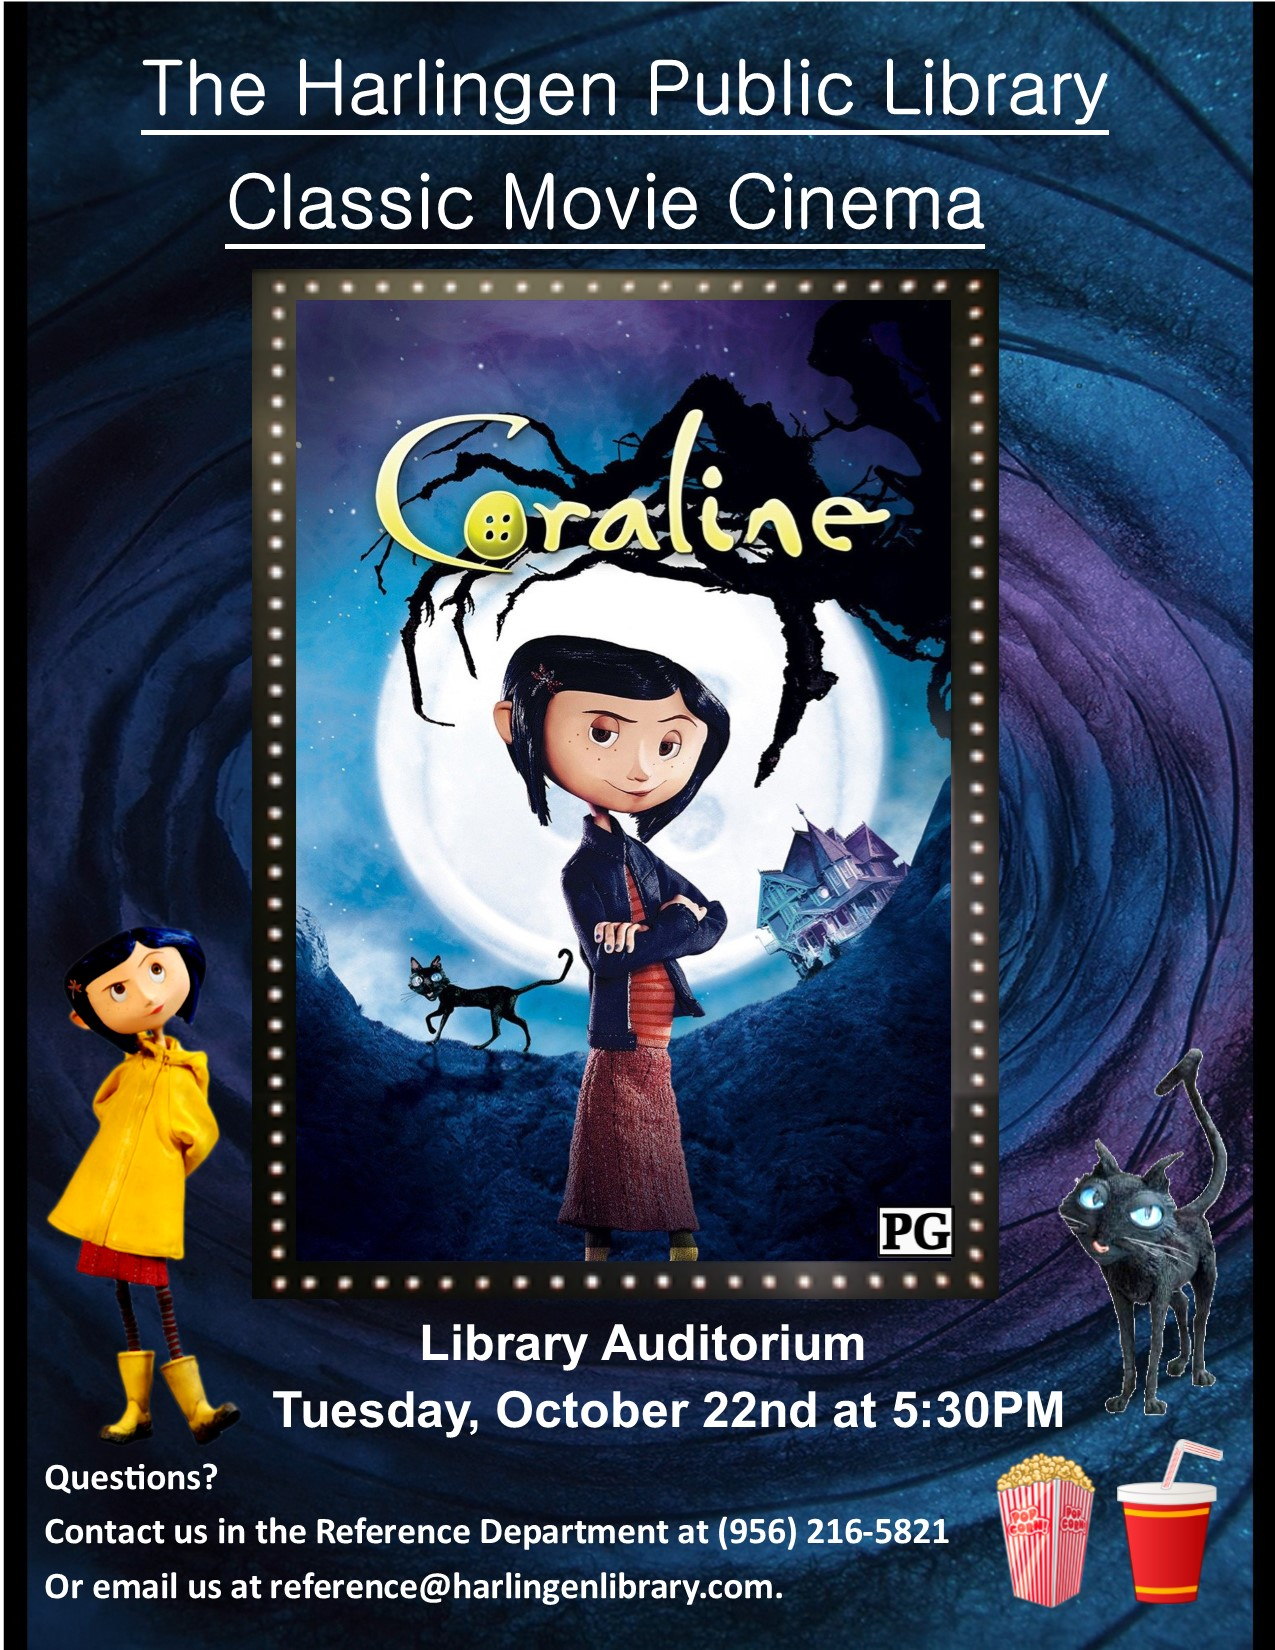 Classic Movie Cinema Coraline Harlingen Public Library